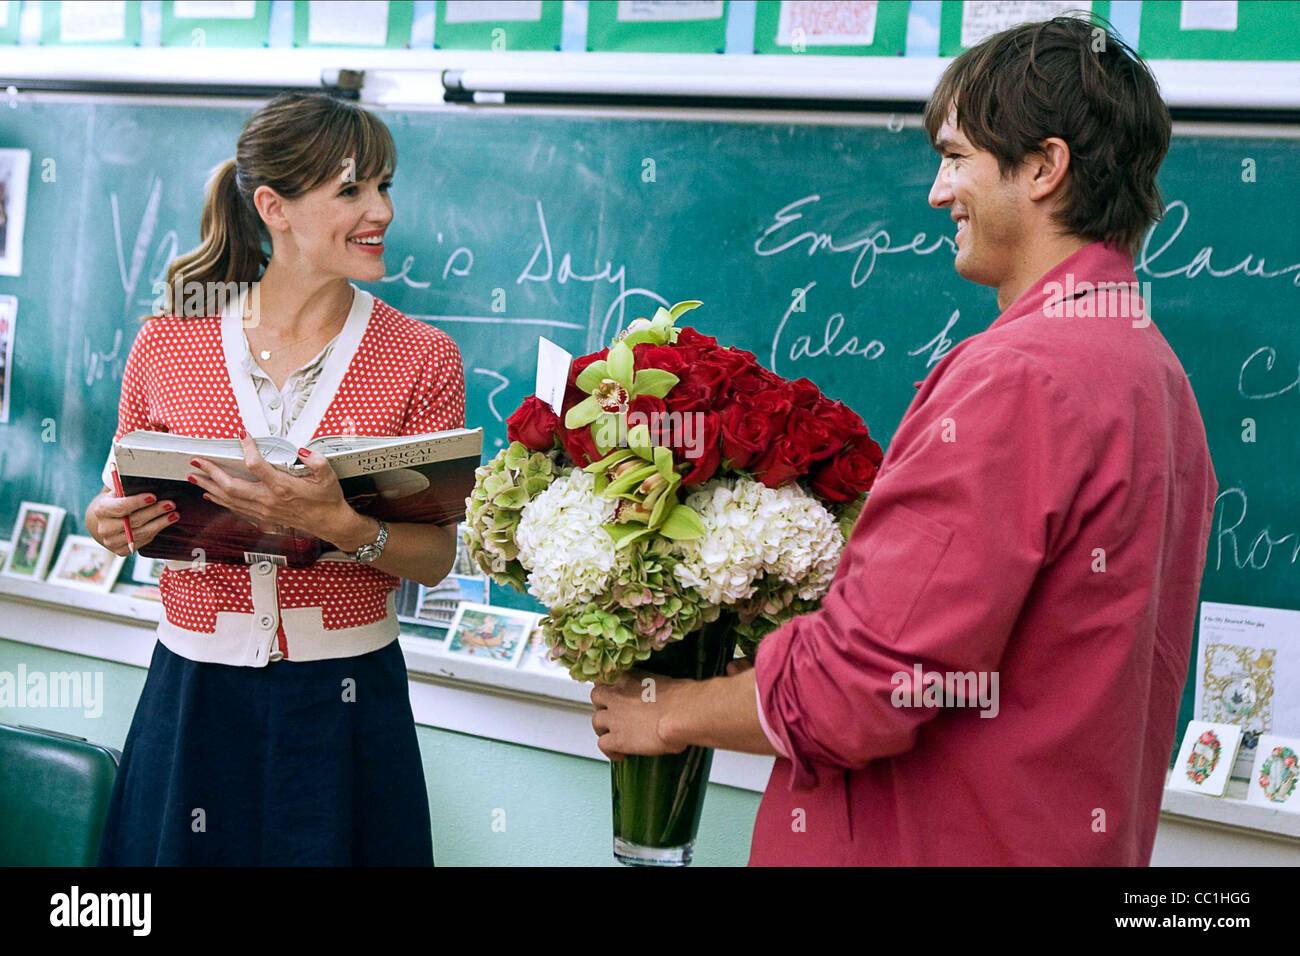 JENNIFER Garner y Ashton Kutcher EL DÍA DE SAN VALENTÍN (2010) Imagen De Stock